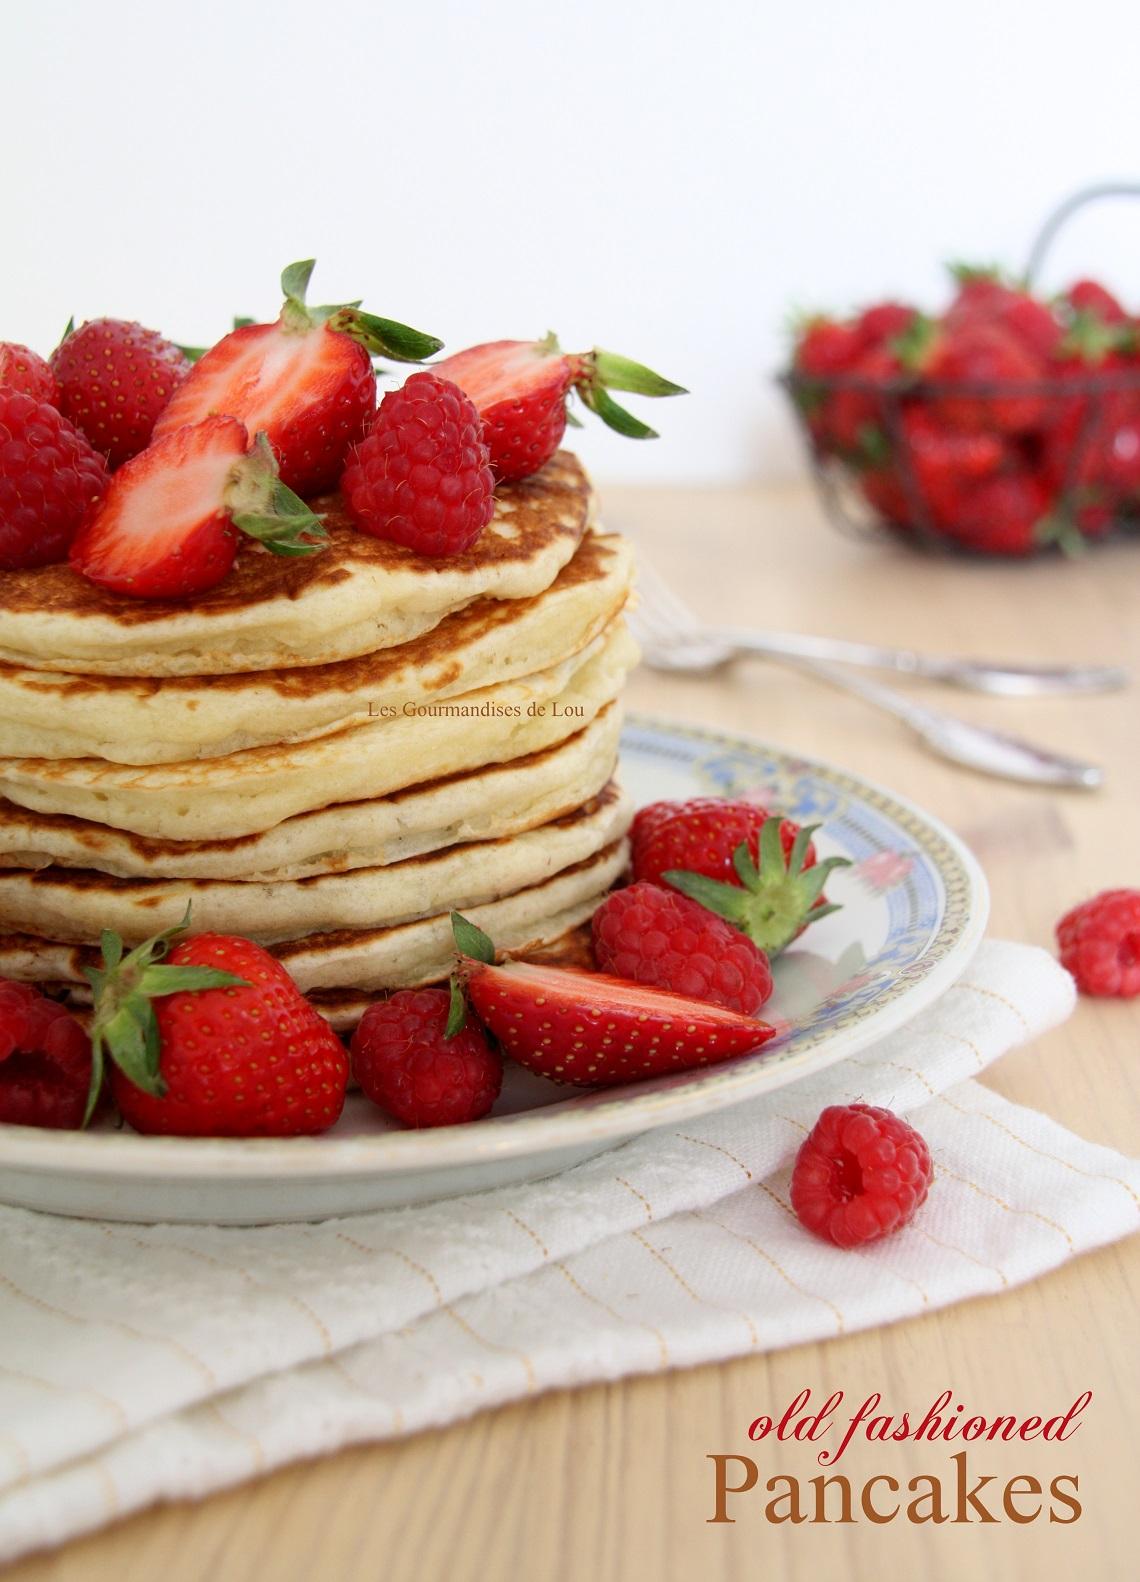 Old fashioned Pancakes (Recette de Martha Stewart)